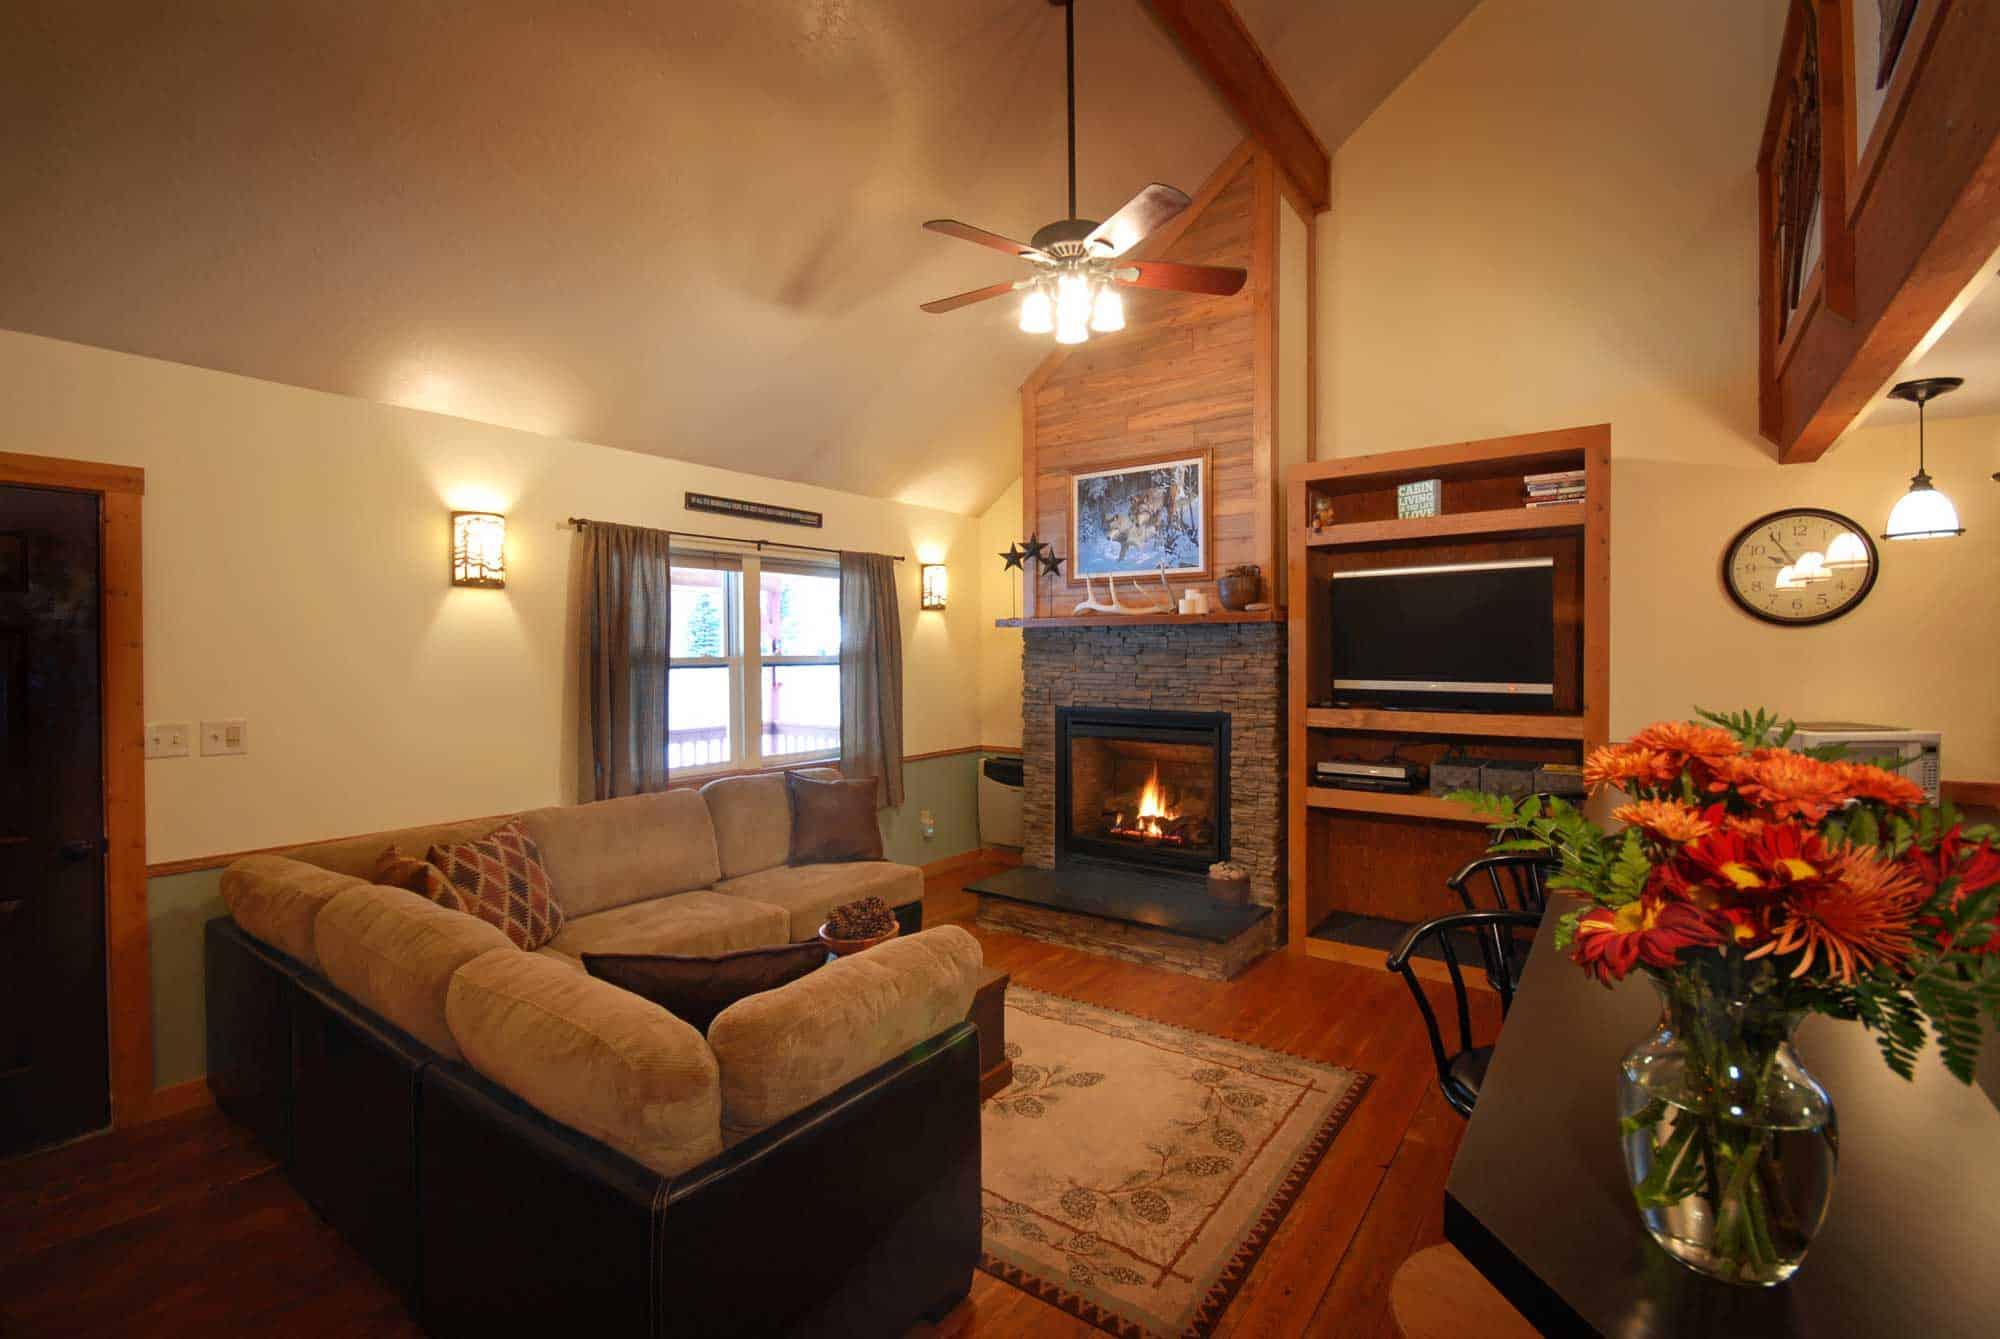 Montana Rock Creek Cabin | Rock Creek Cabin Rentals and Lodging